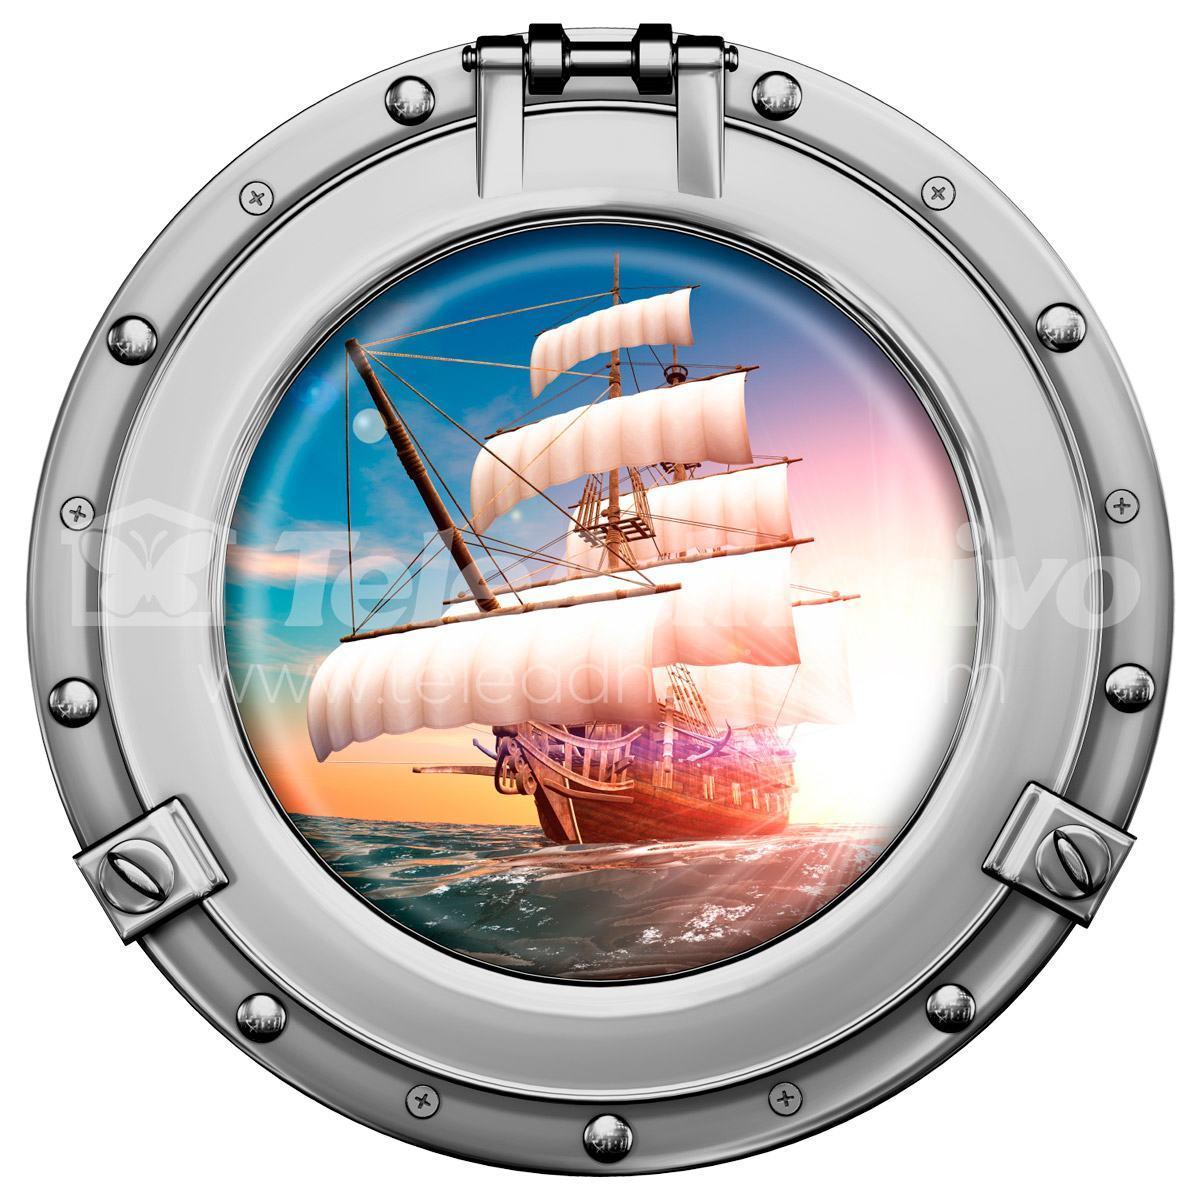 Wandtattoos: Piraten-Segelschiff